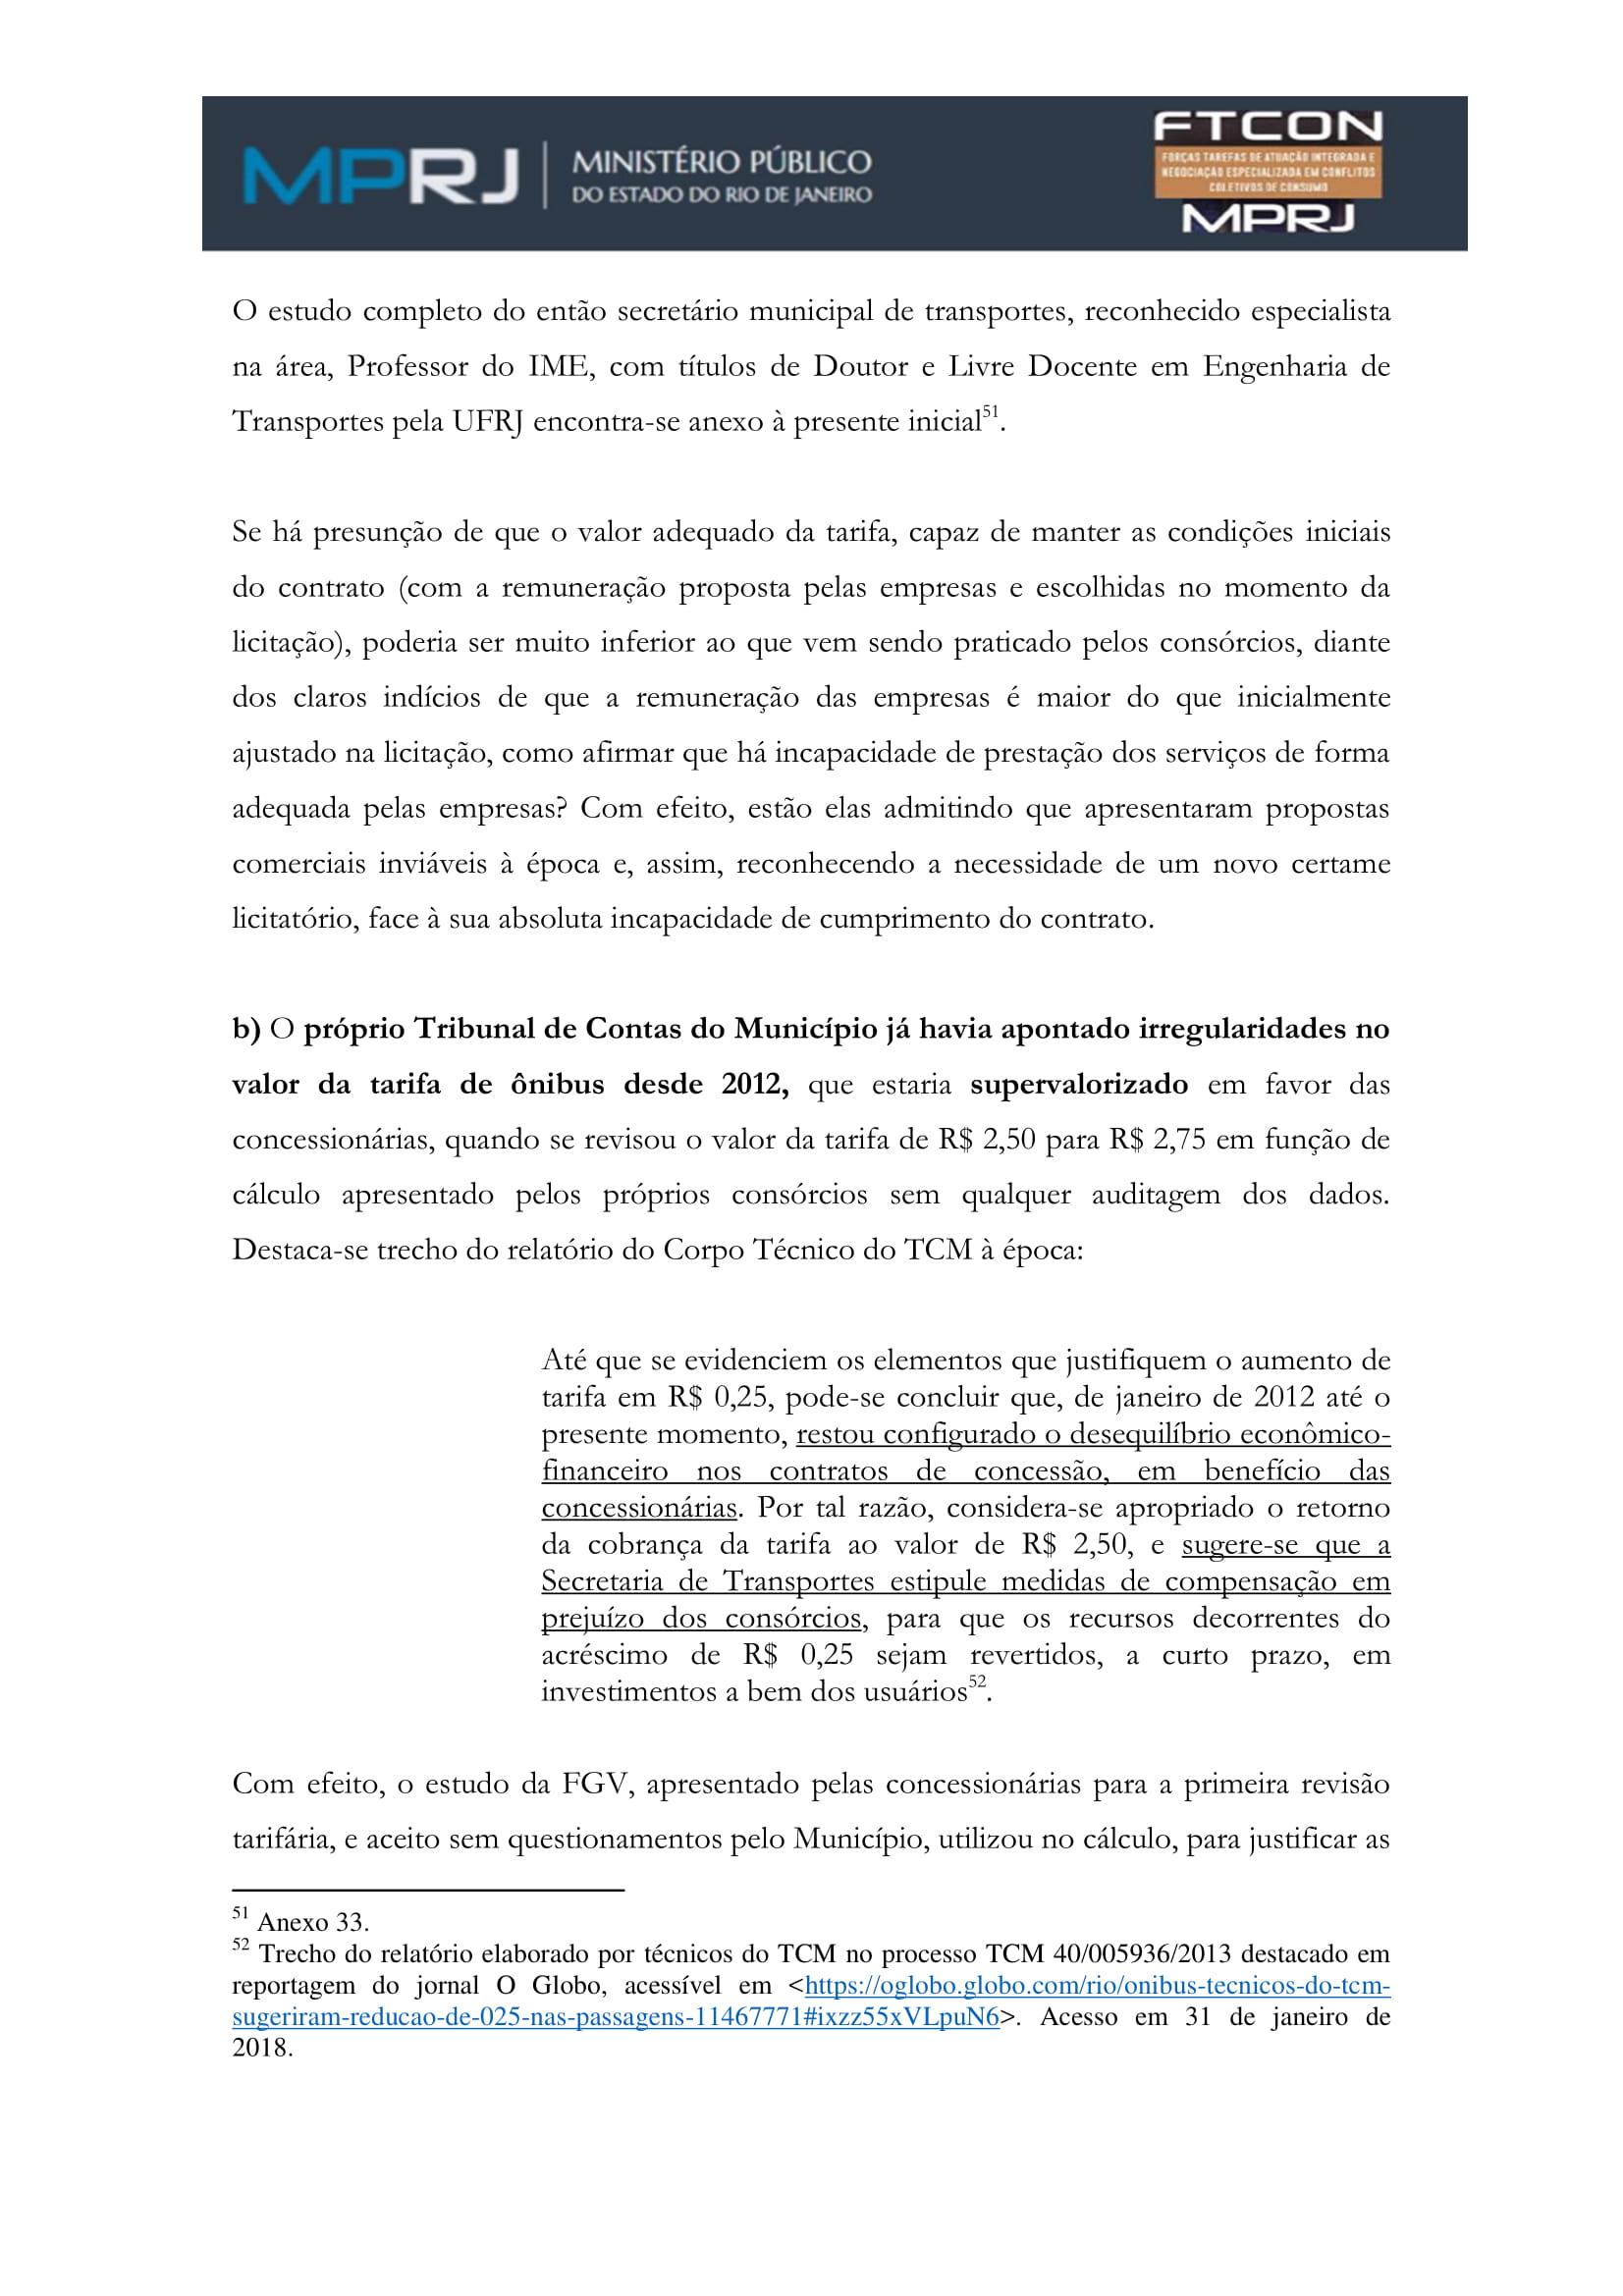 acp_caducidade_onibus_dr_rt-070